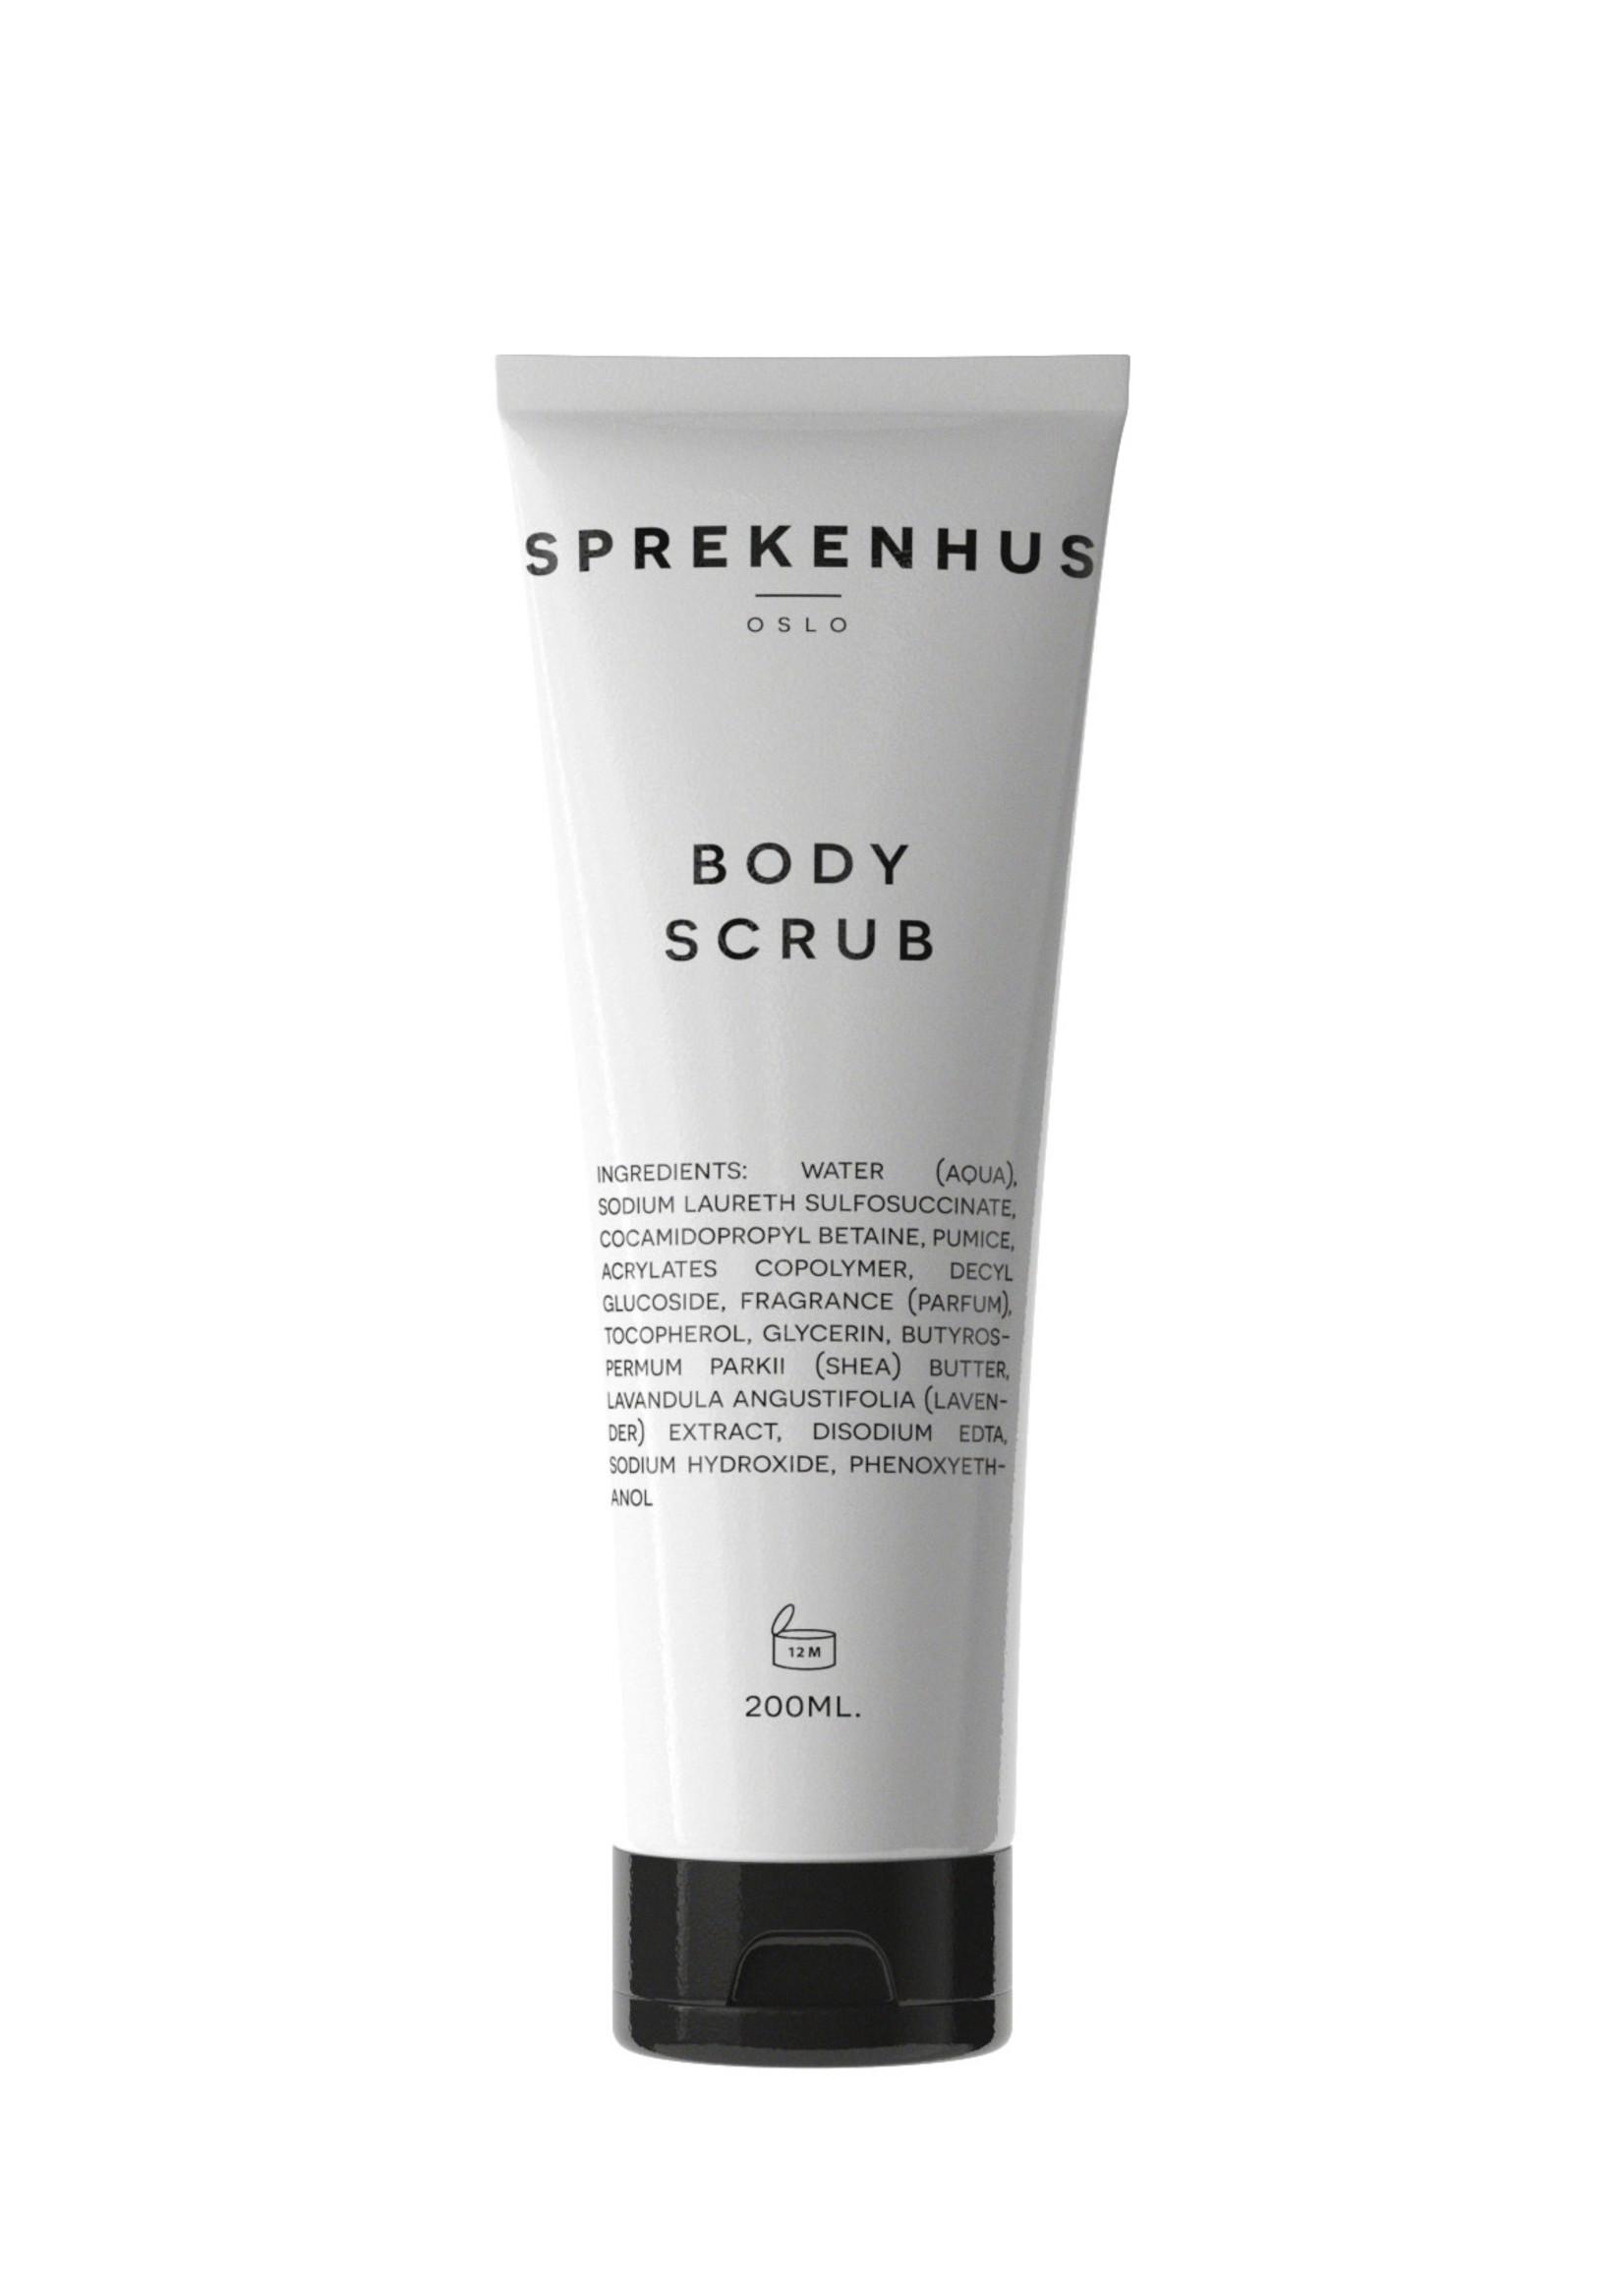 A. Sprekenhus Body Scrub 200ml